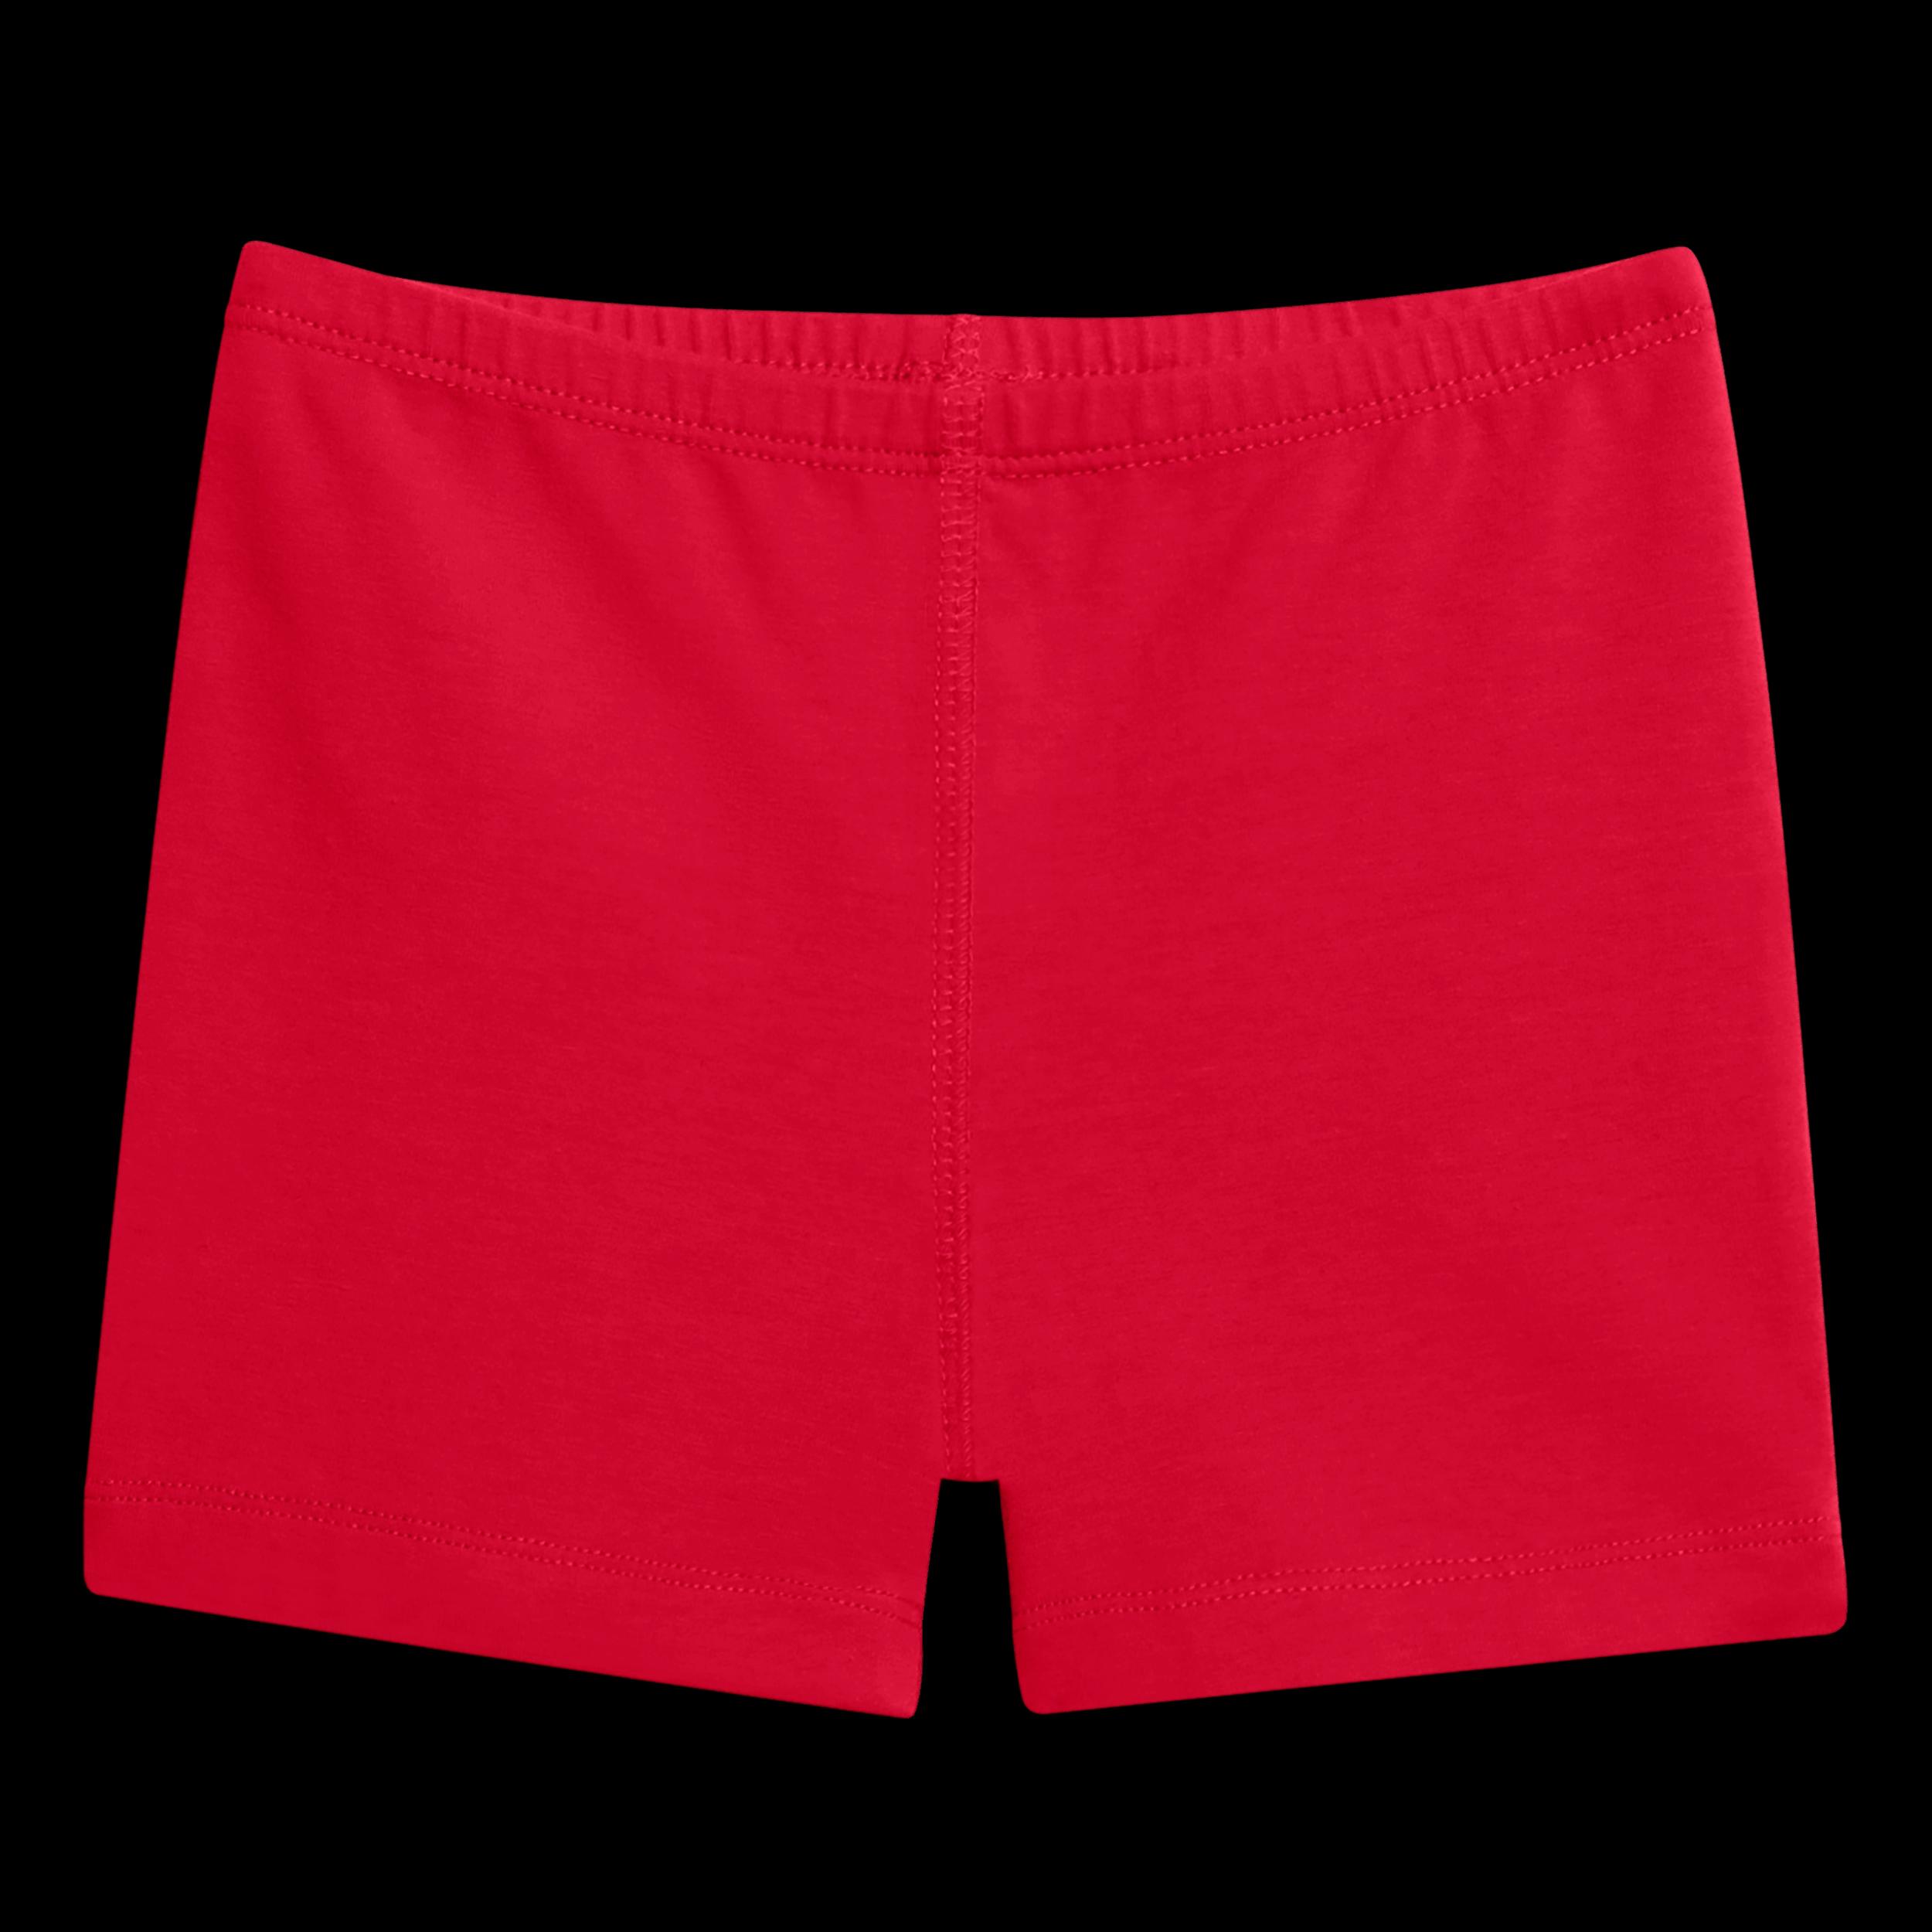 Shorts for Dresses